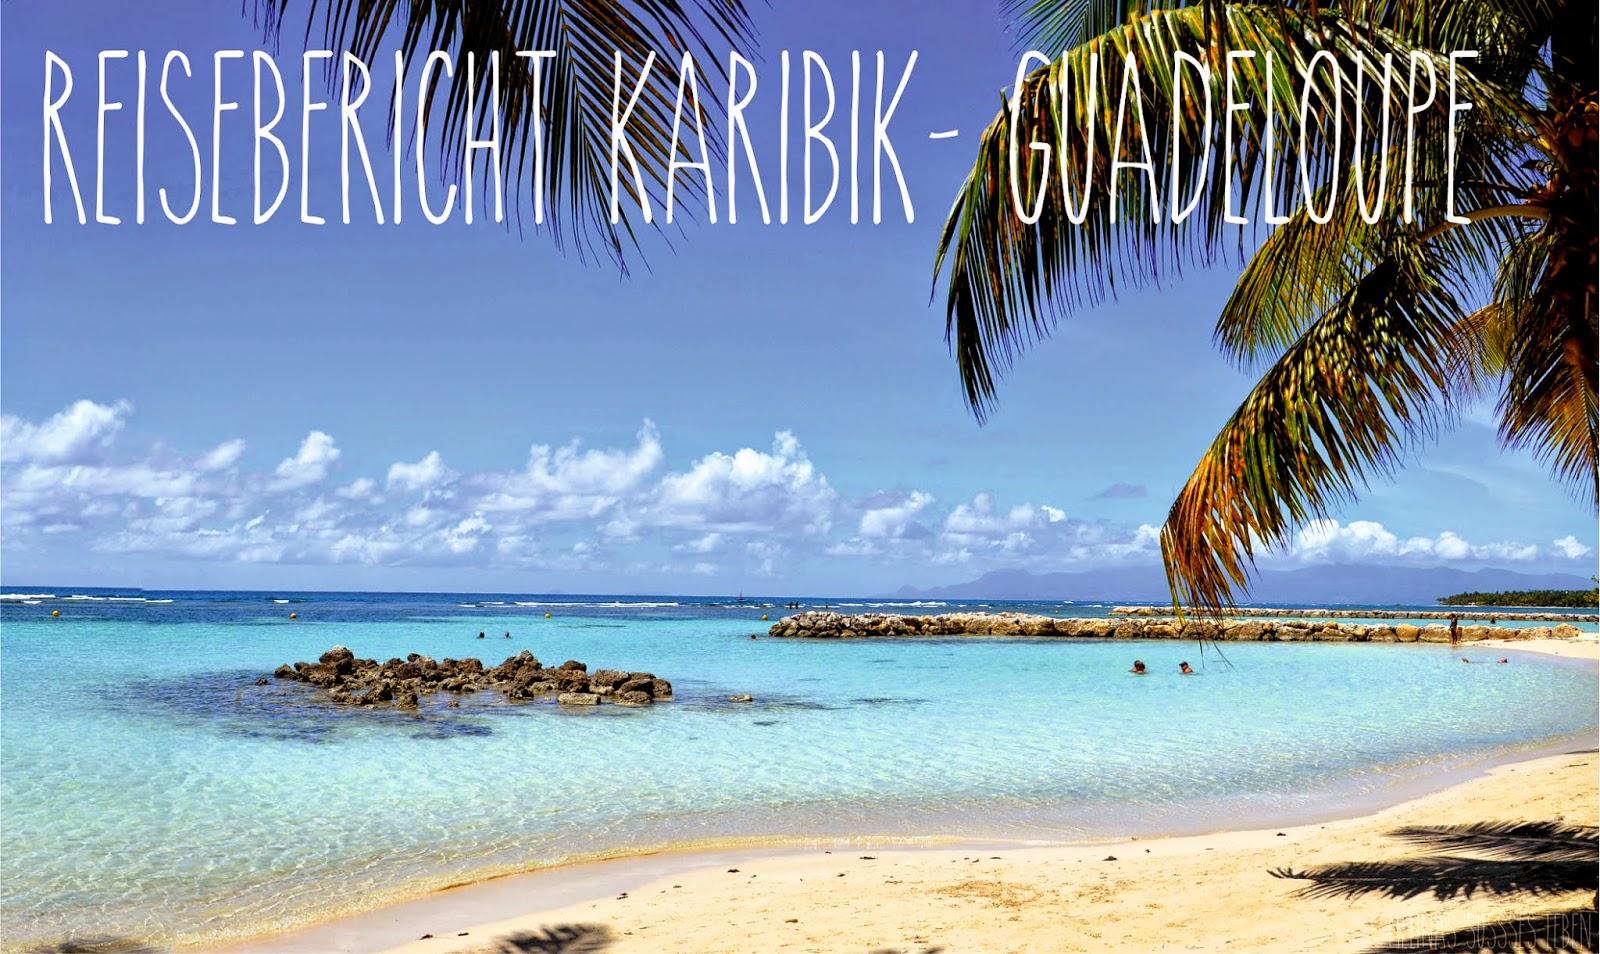 http://melinas-suesses-leben.blogspot.de/2015/01/reiserbericht-guadeloupe-karibik.html